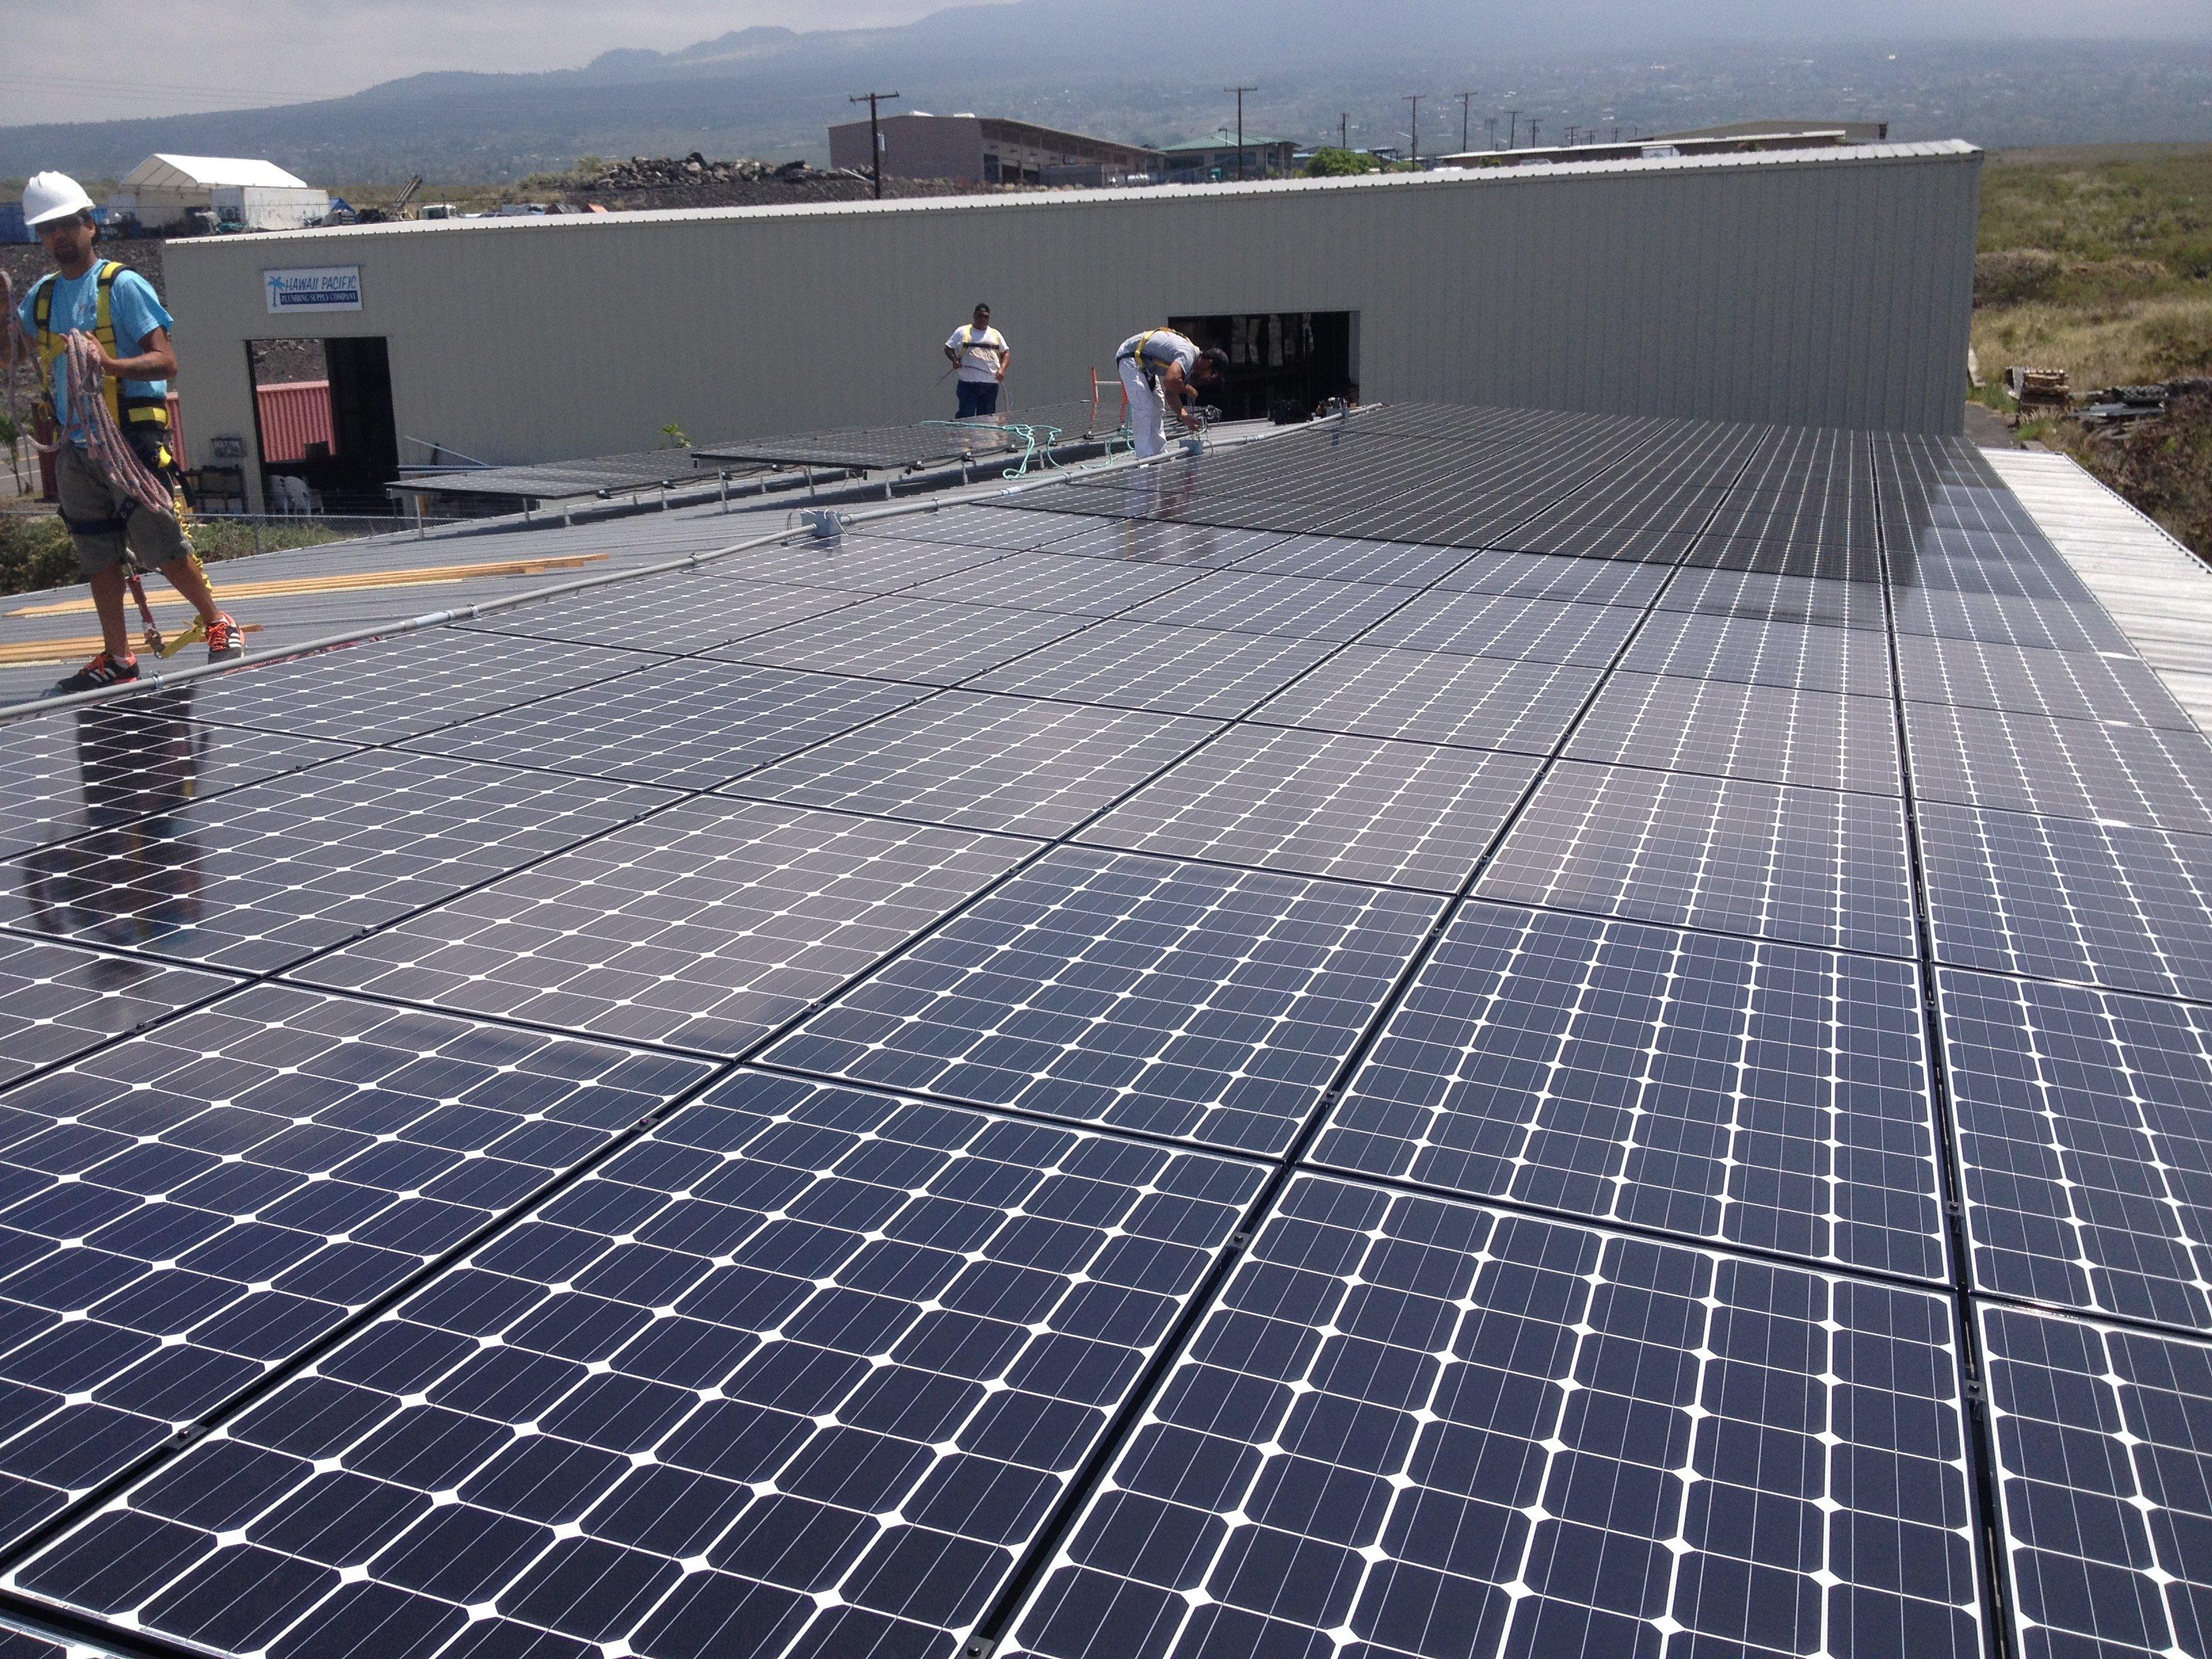 Kohala Public library installed 10 KW solar power system in Honokaa, HI